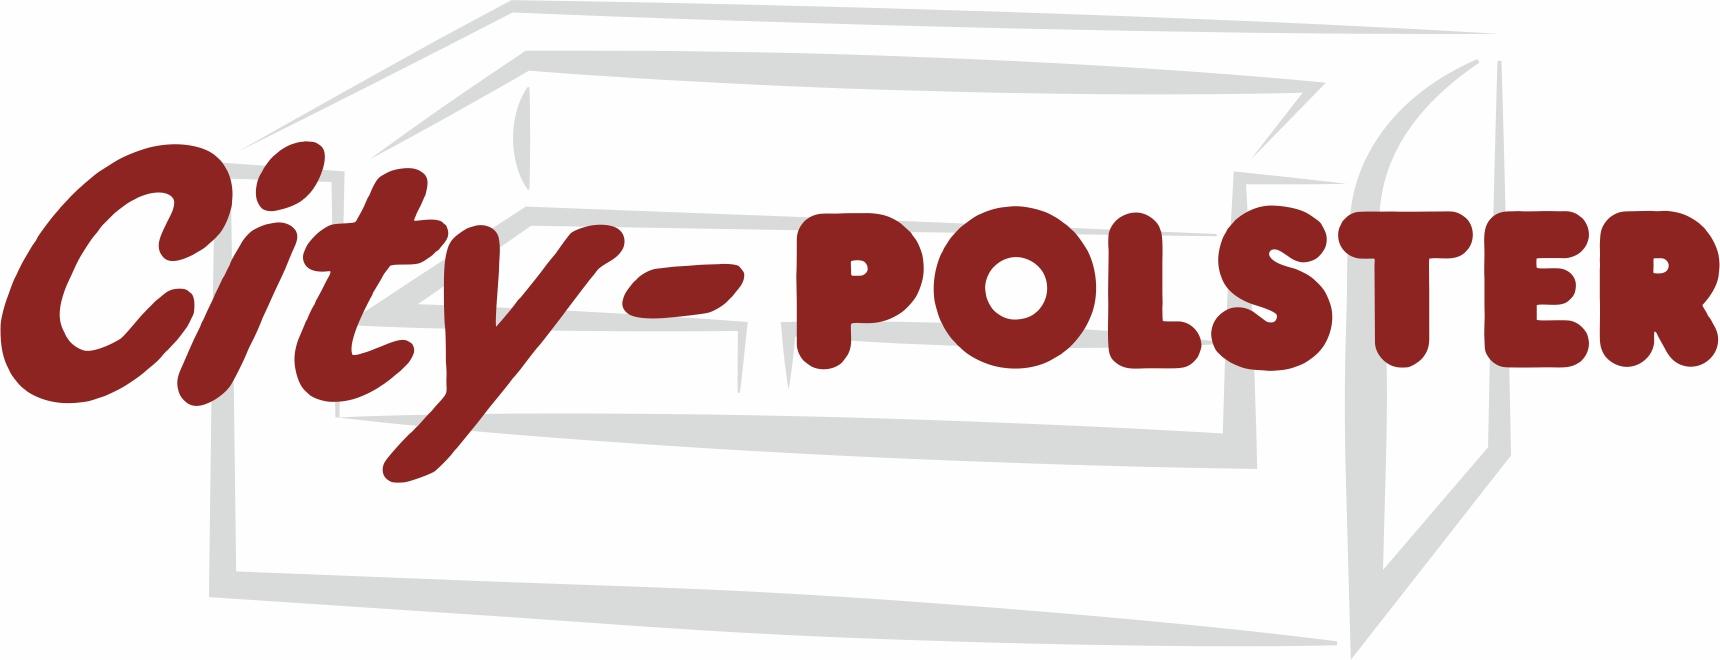 city-polster-trier-gmbh-trier-quint logo